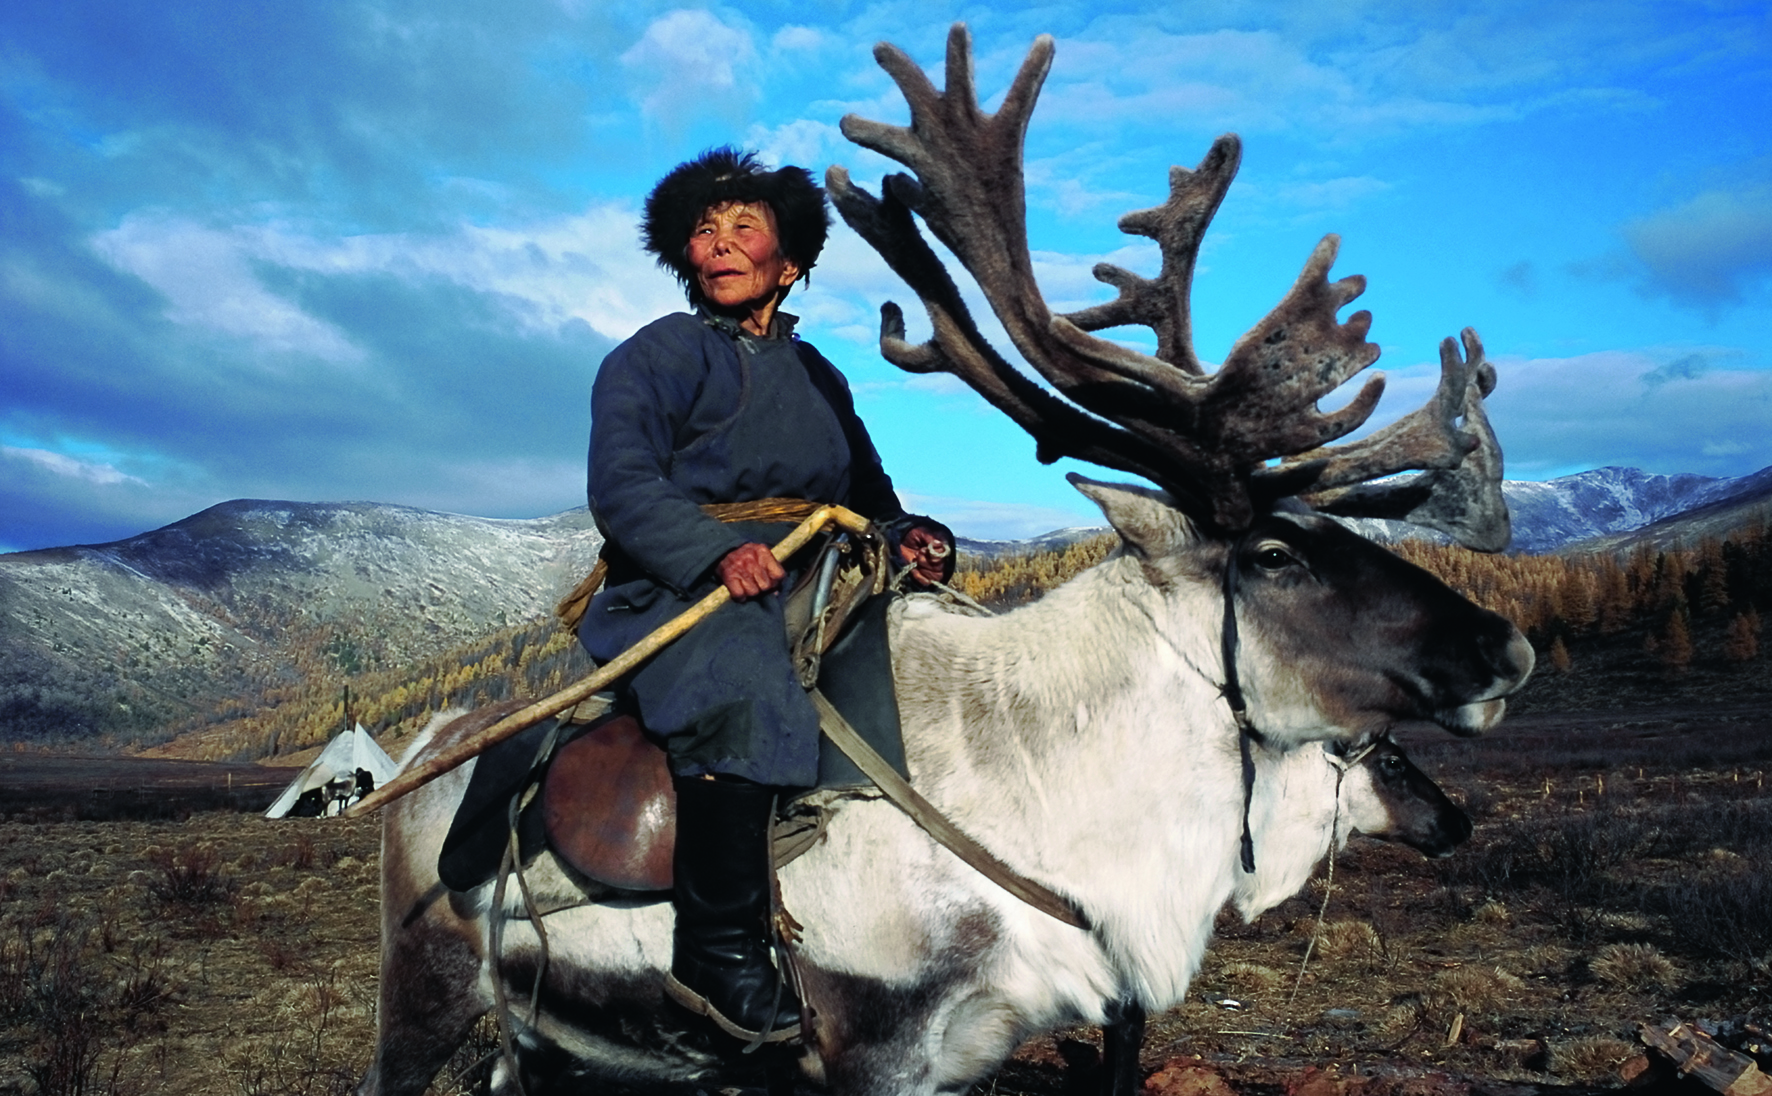 Shaman matriarch, West Taiga, Hovsgol Province, Mongolia, 2000   Photo © 2016 Hamid Sardar. All rights reserved.  www.hamidsardarphoto.com